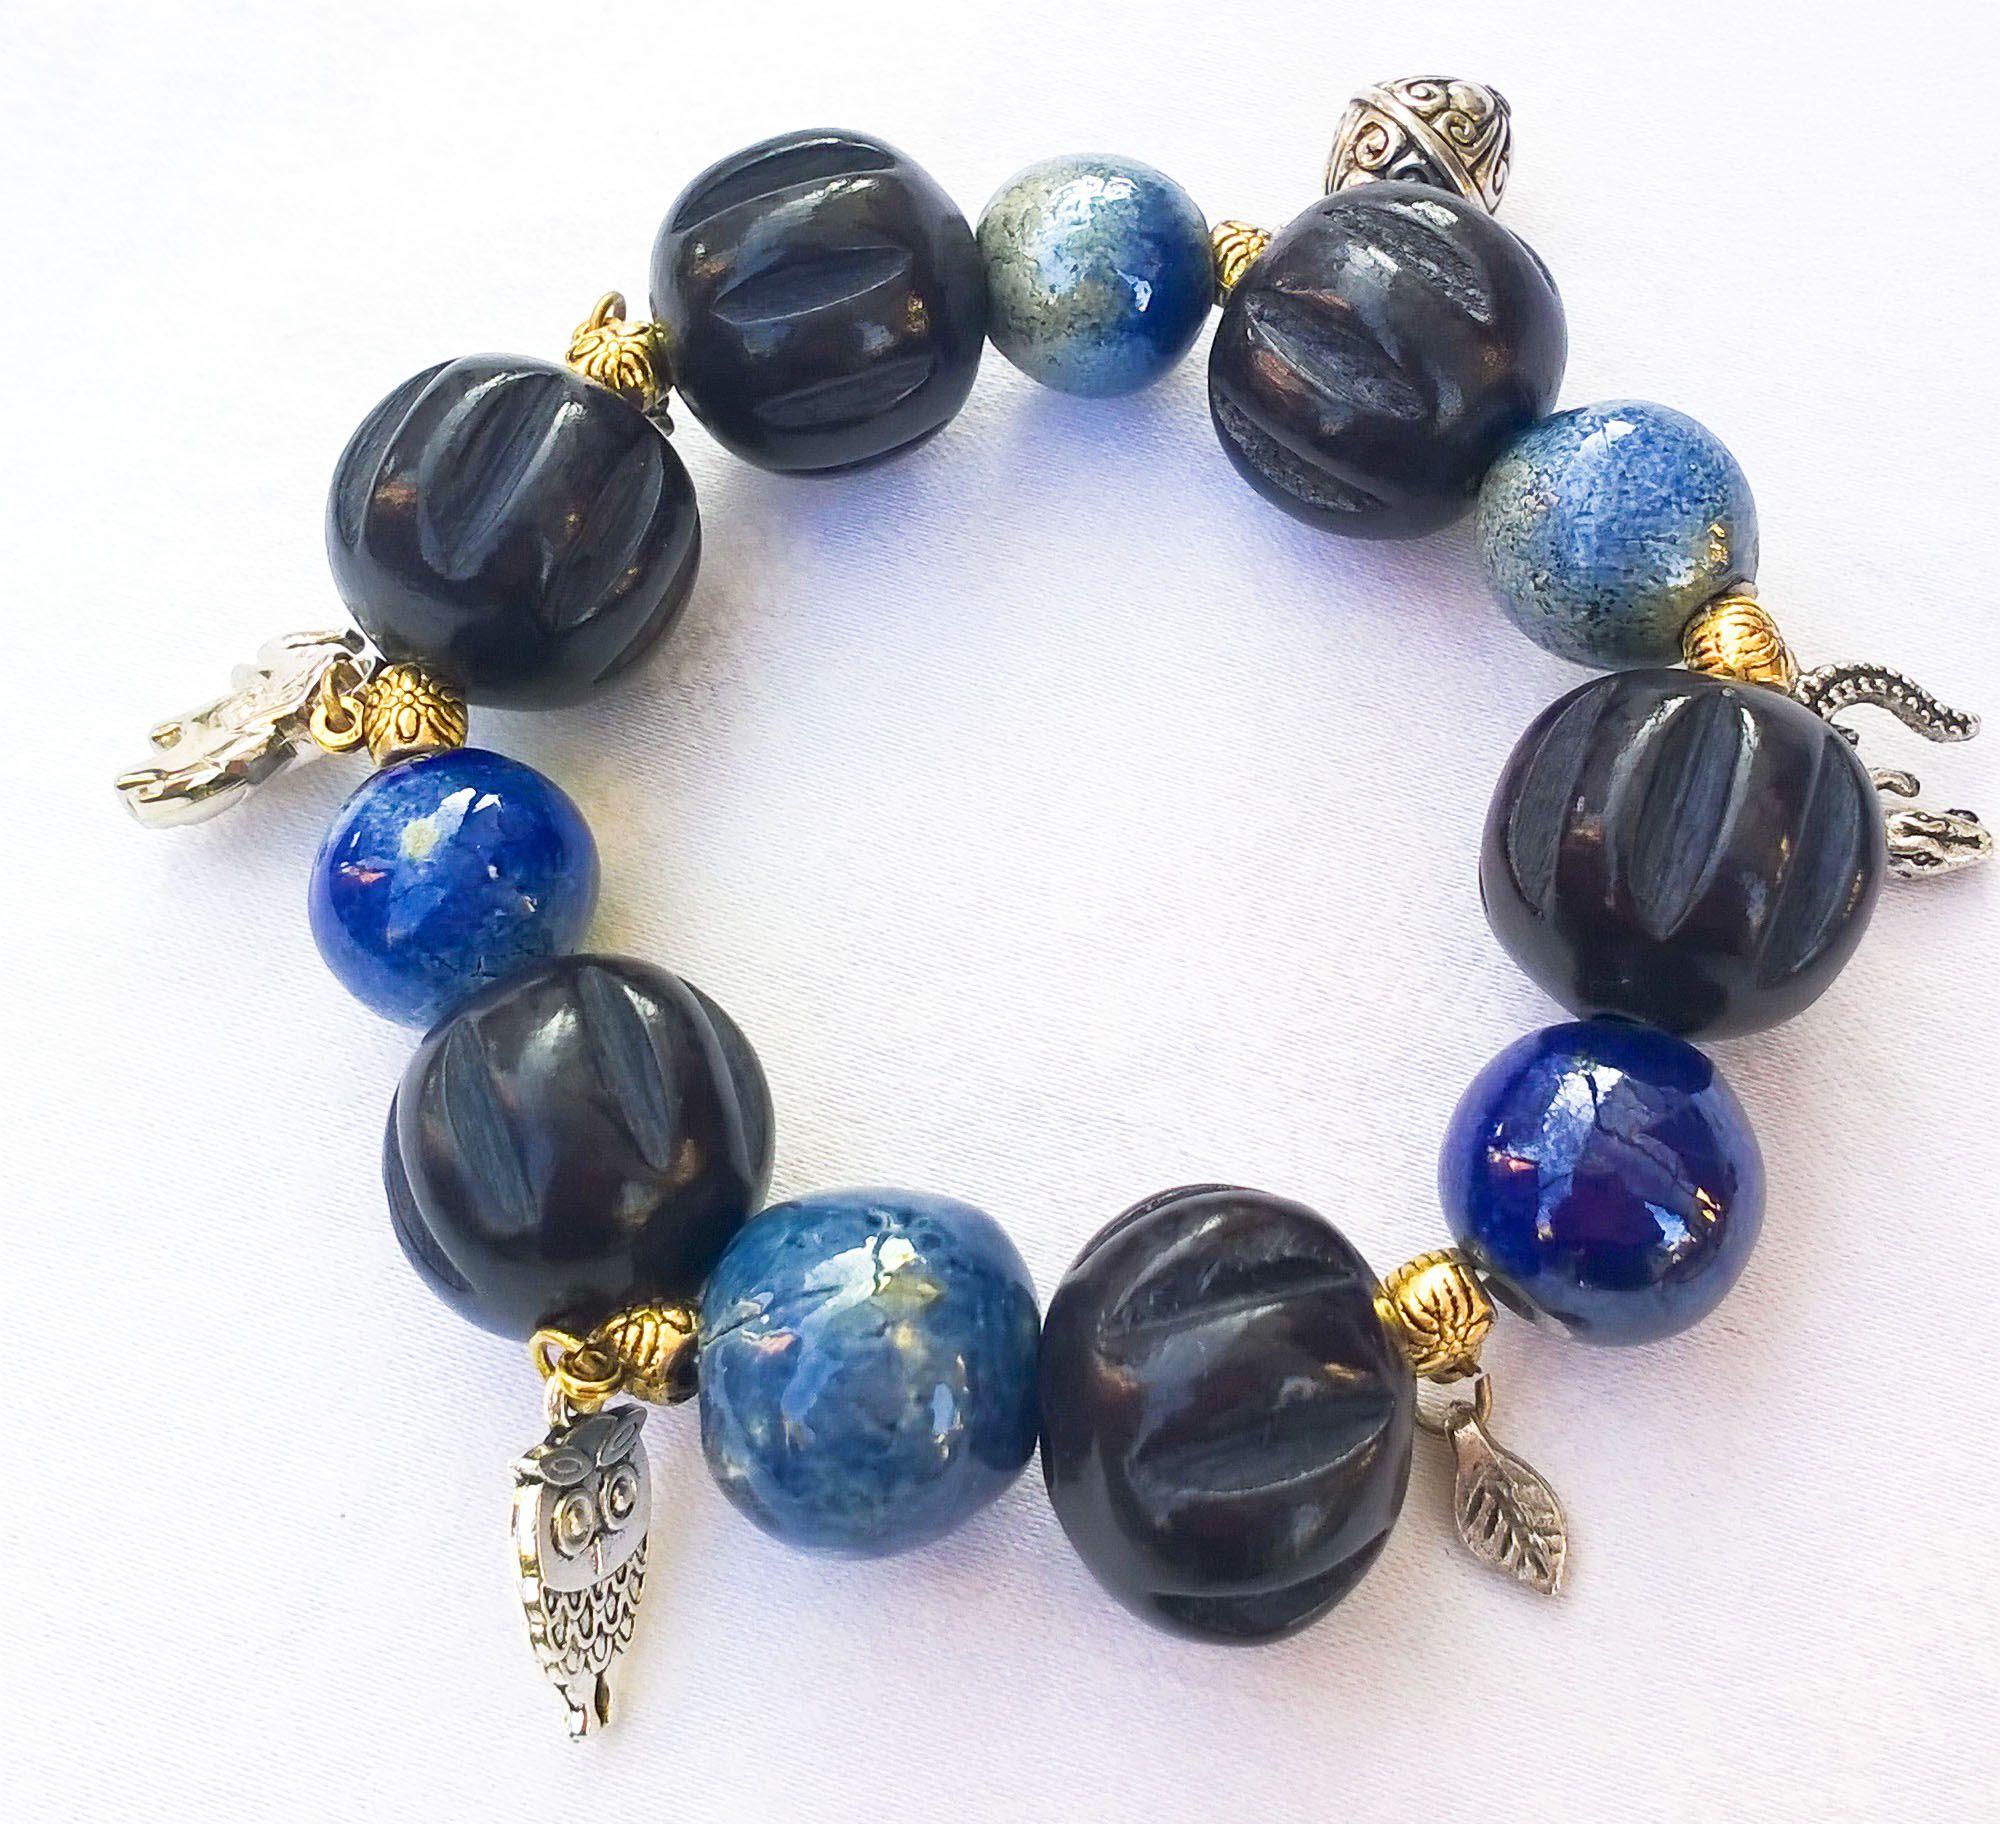 bracciale toni del blu, perle in ceramica raku, legno intervallati da pendenti